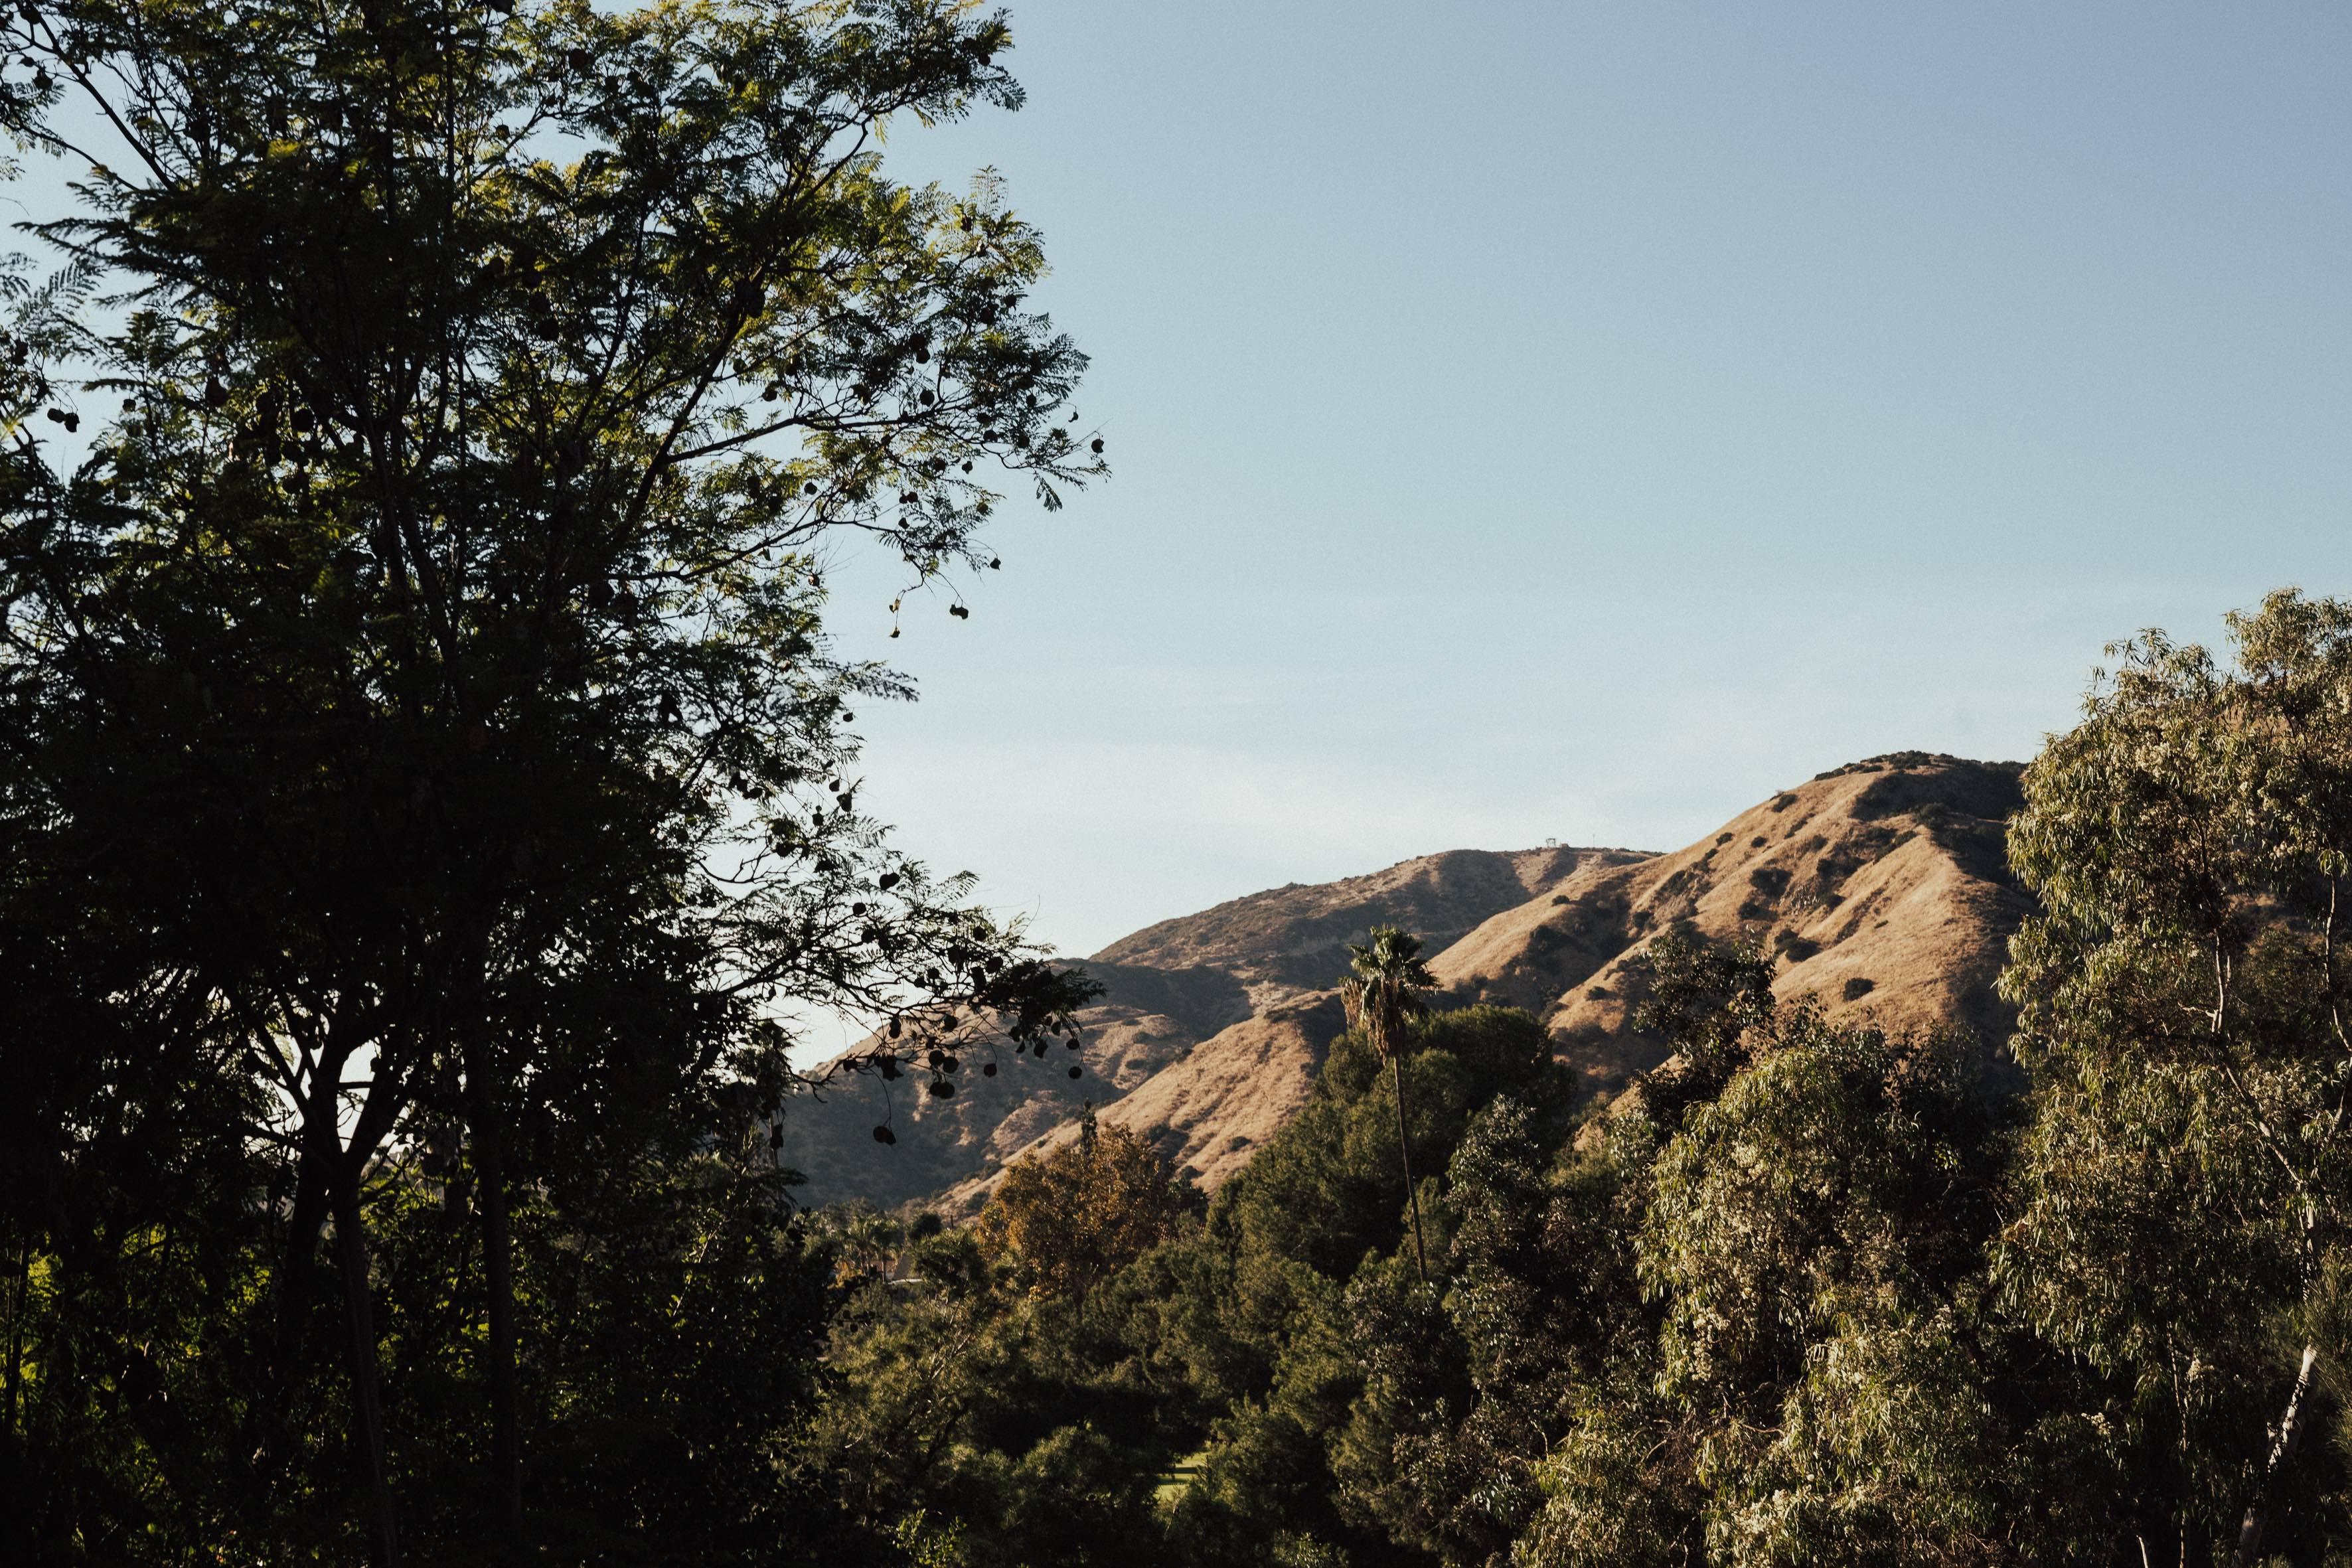 Wedding - Wedgewood Sierra La Verne | Wedding Photography and Wedding Videography